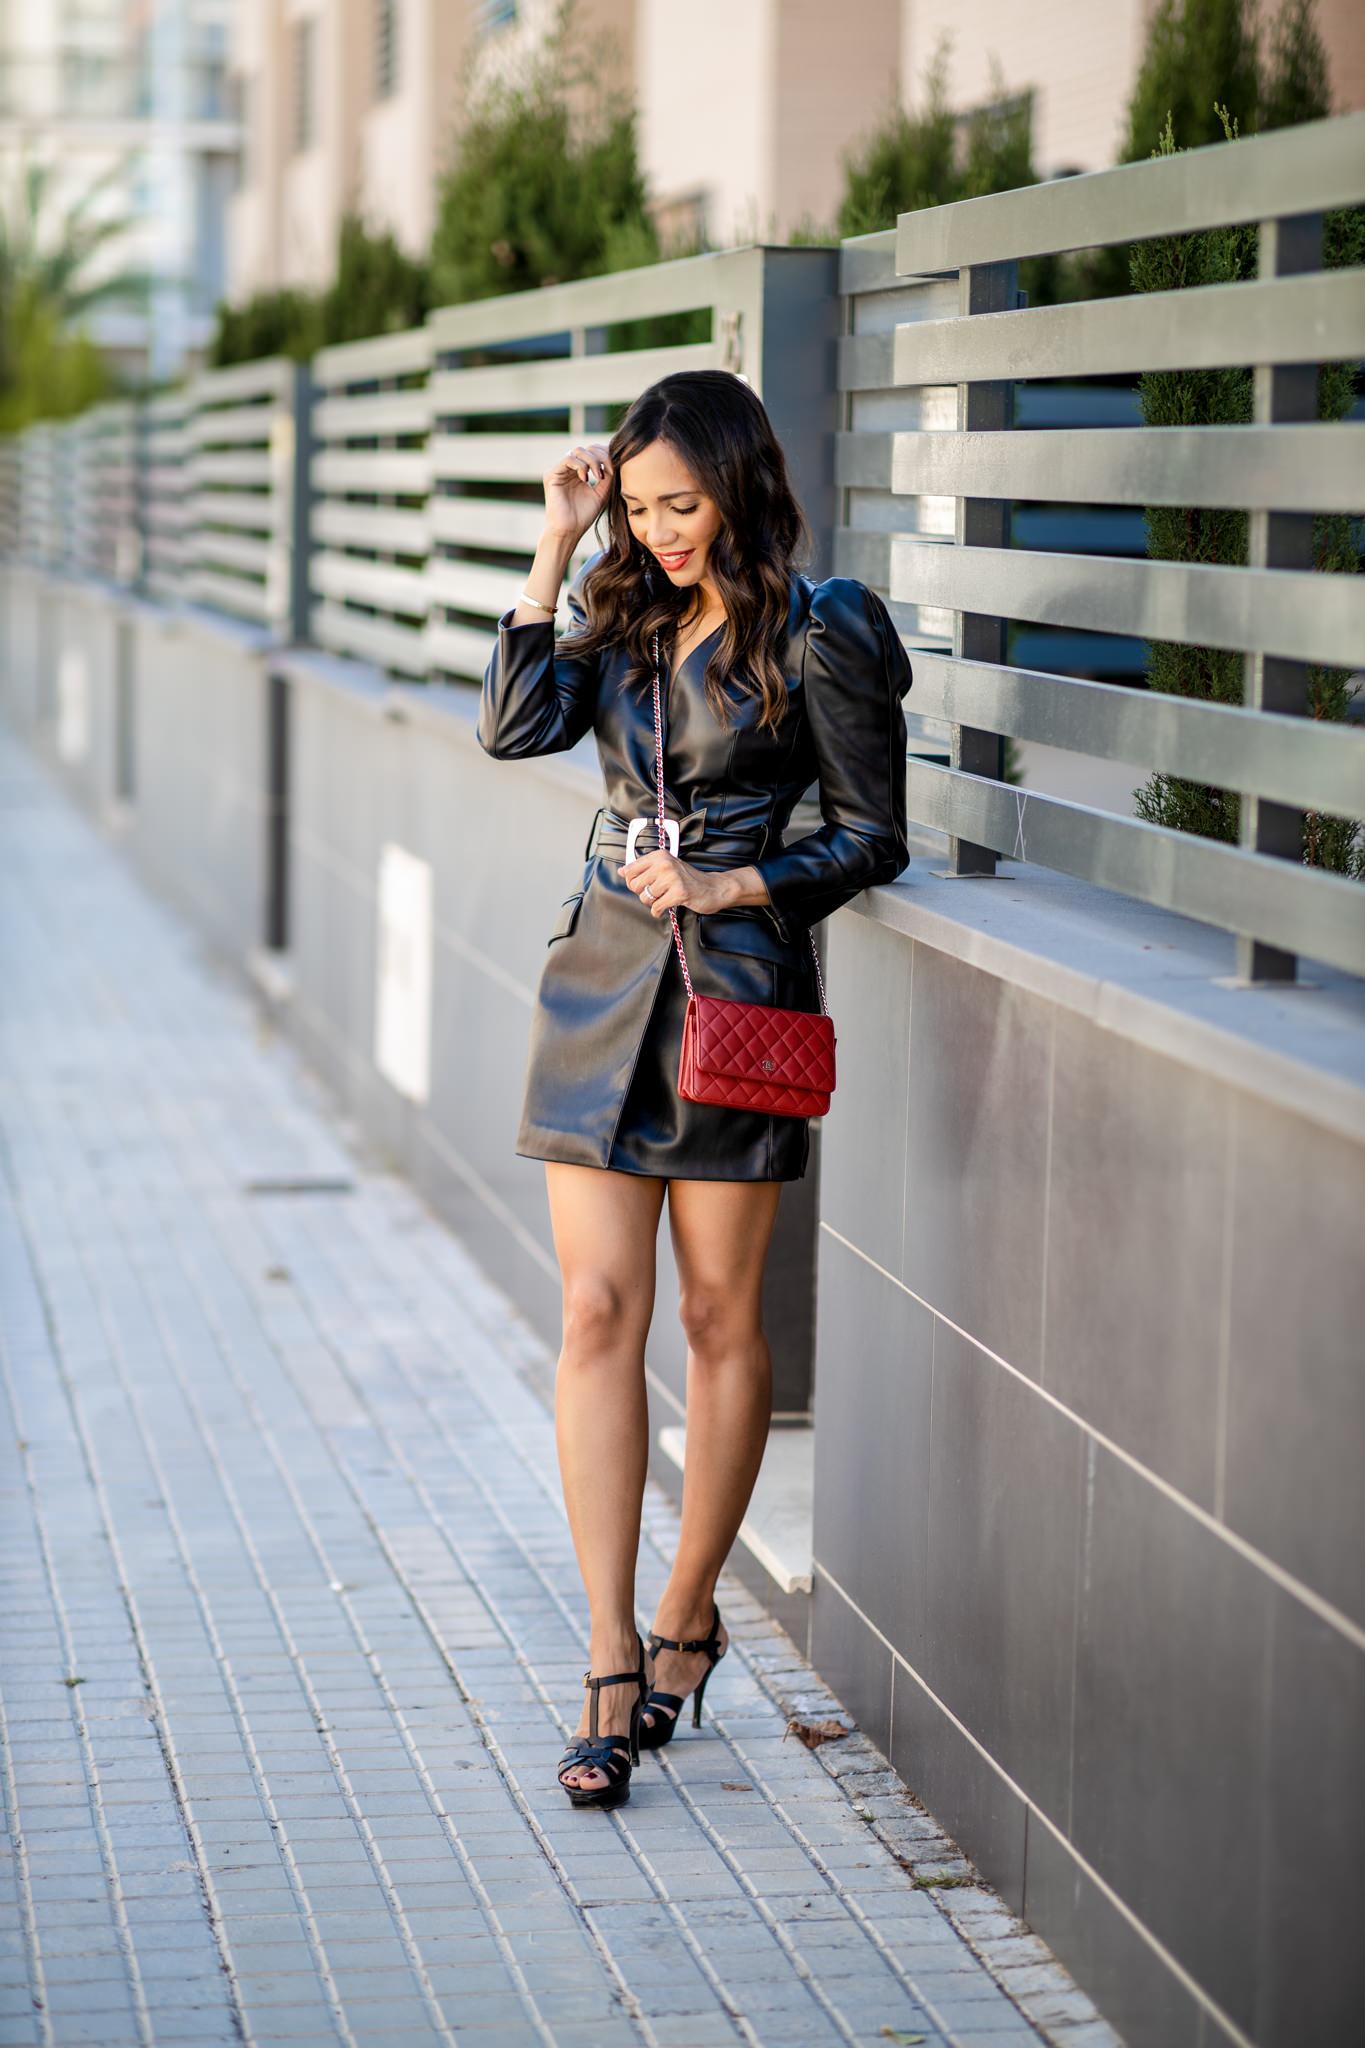 Blog Csrolina Personal Shopper